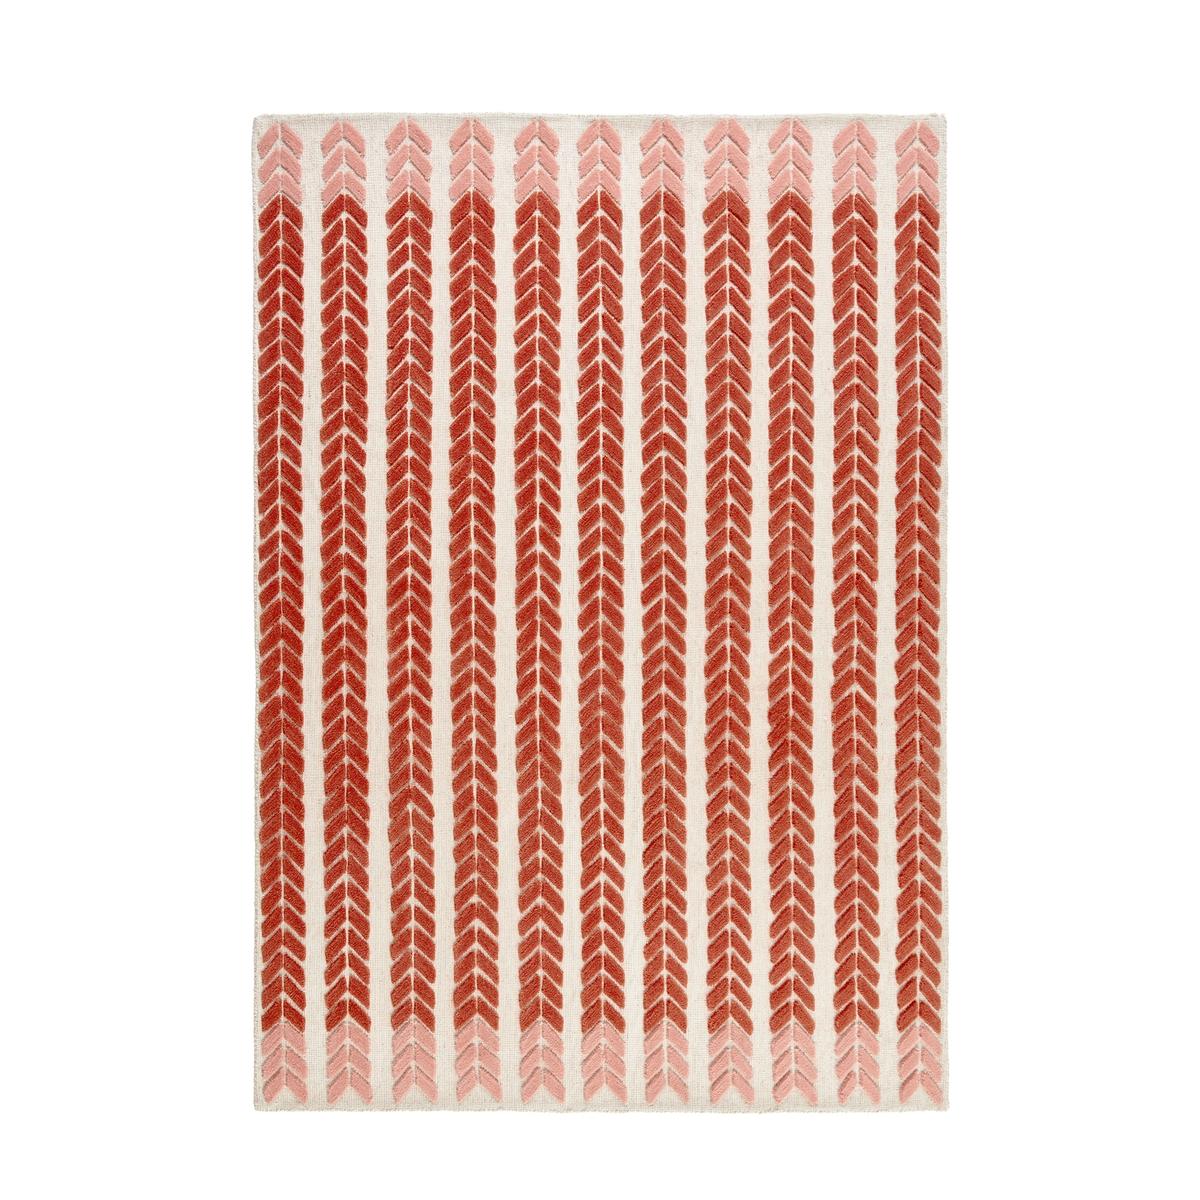 цена Ковер La Redoute Из шерсти 120 x 170 см розовый онлайн в 2017 году